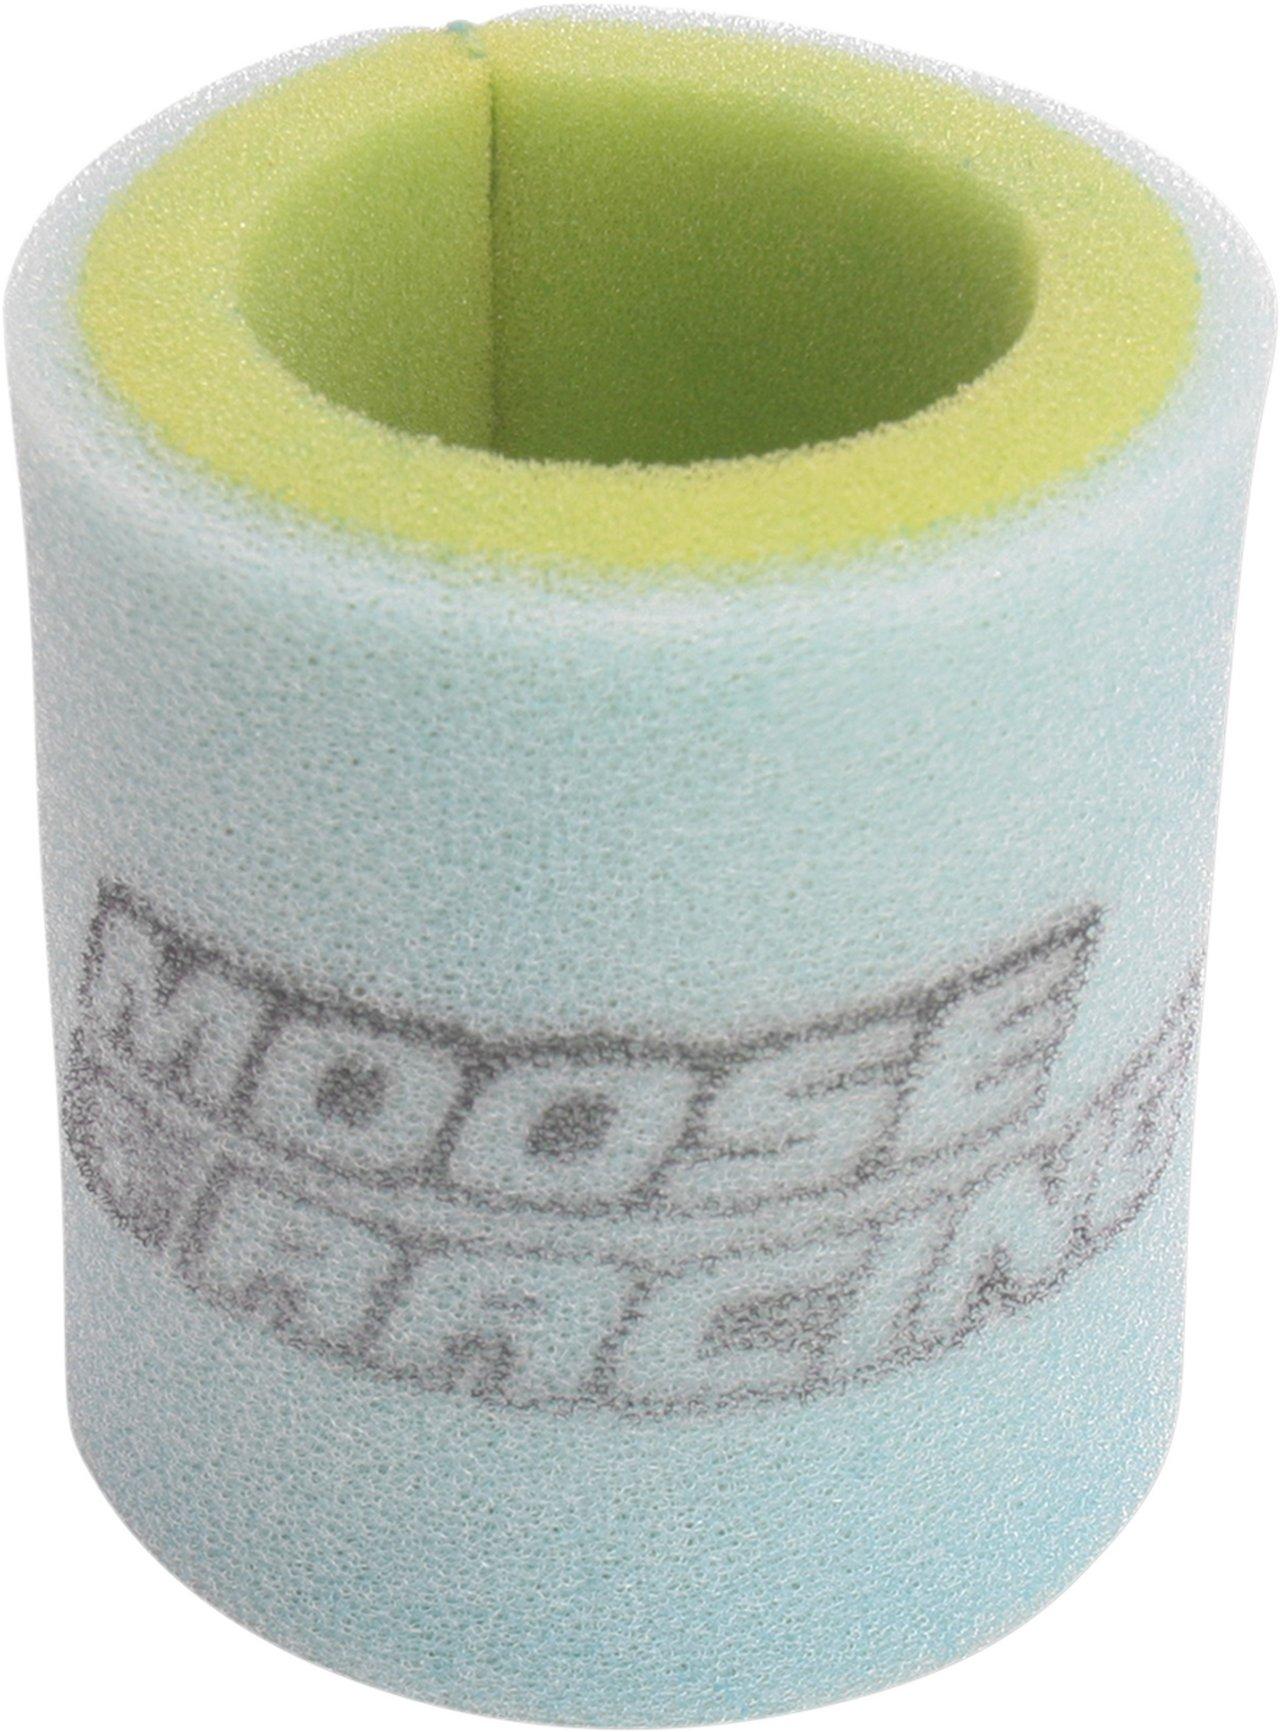 【MOOSE RACING】PPO (PRECISION PRE-OILED) 空氣濾芯 [1011-2541] - 「Webike-摩托百貨」